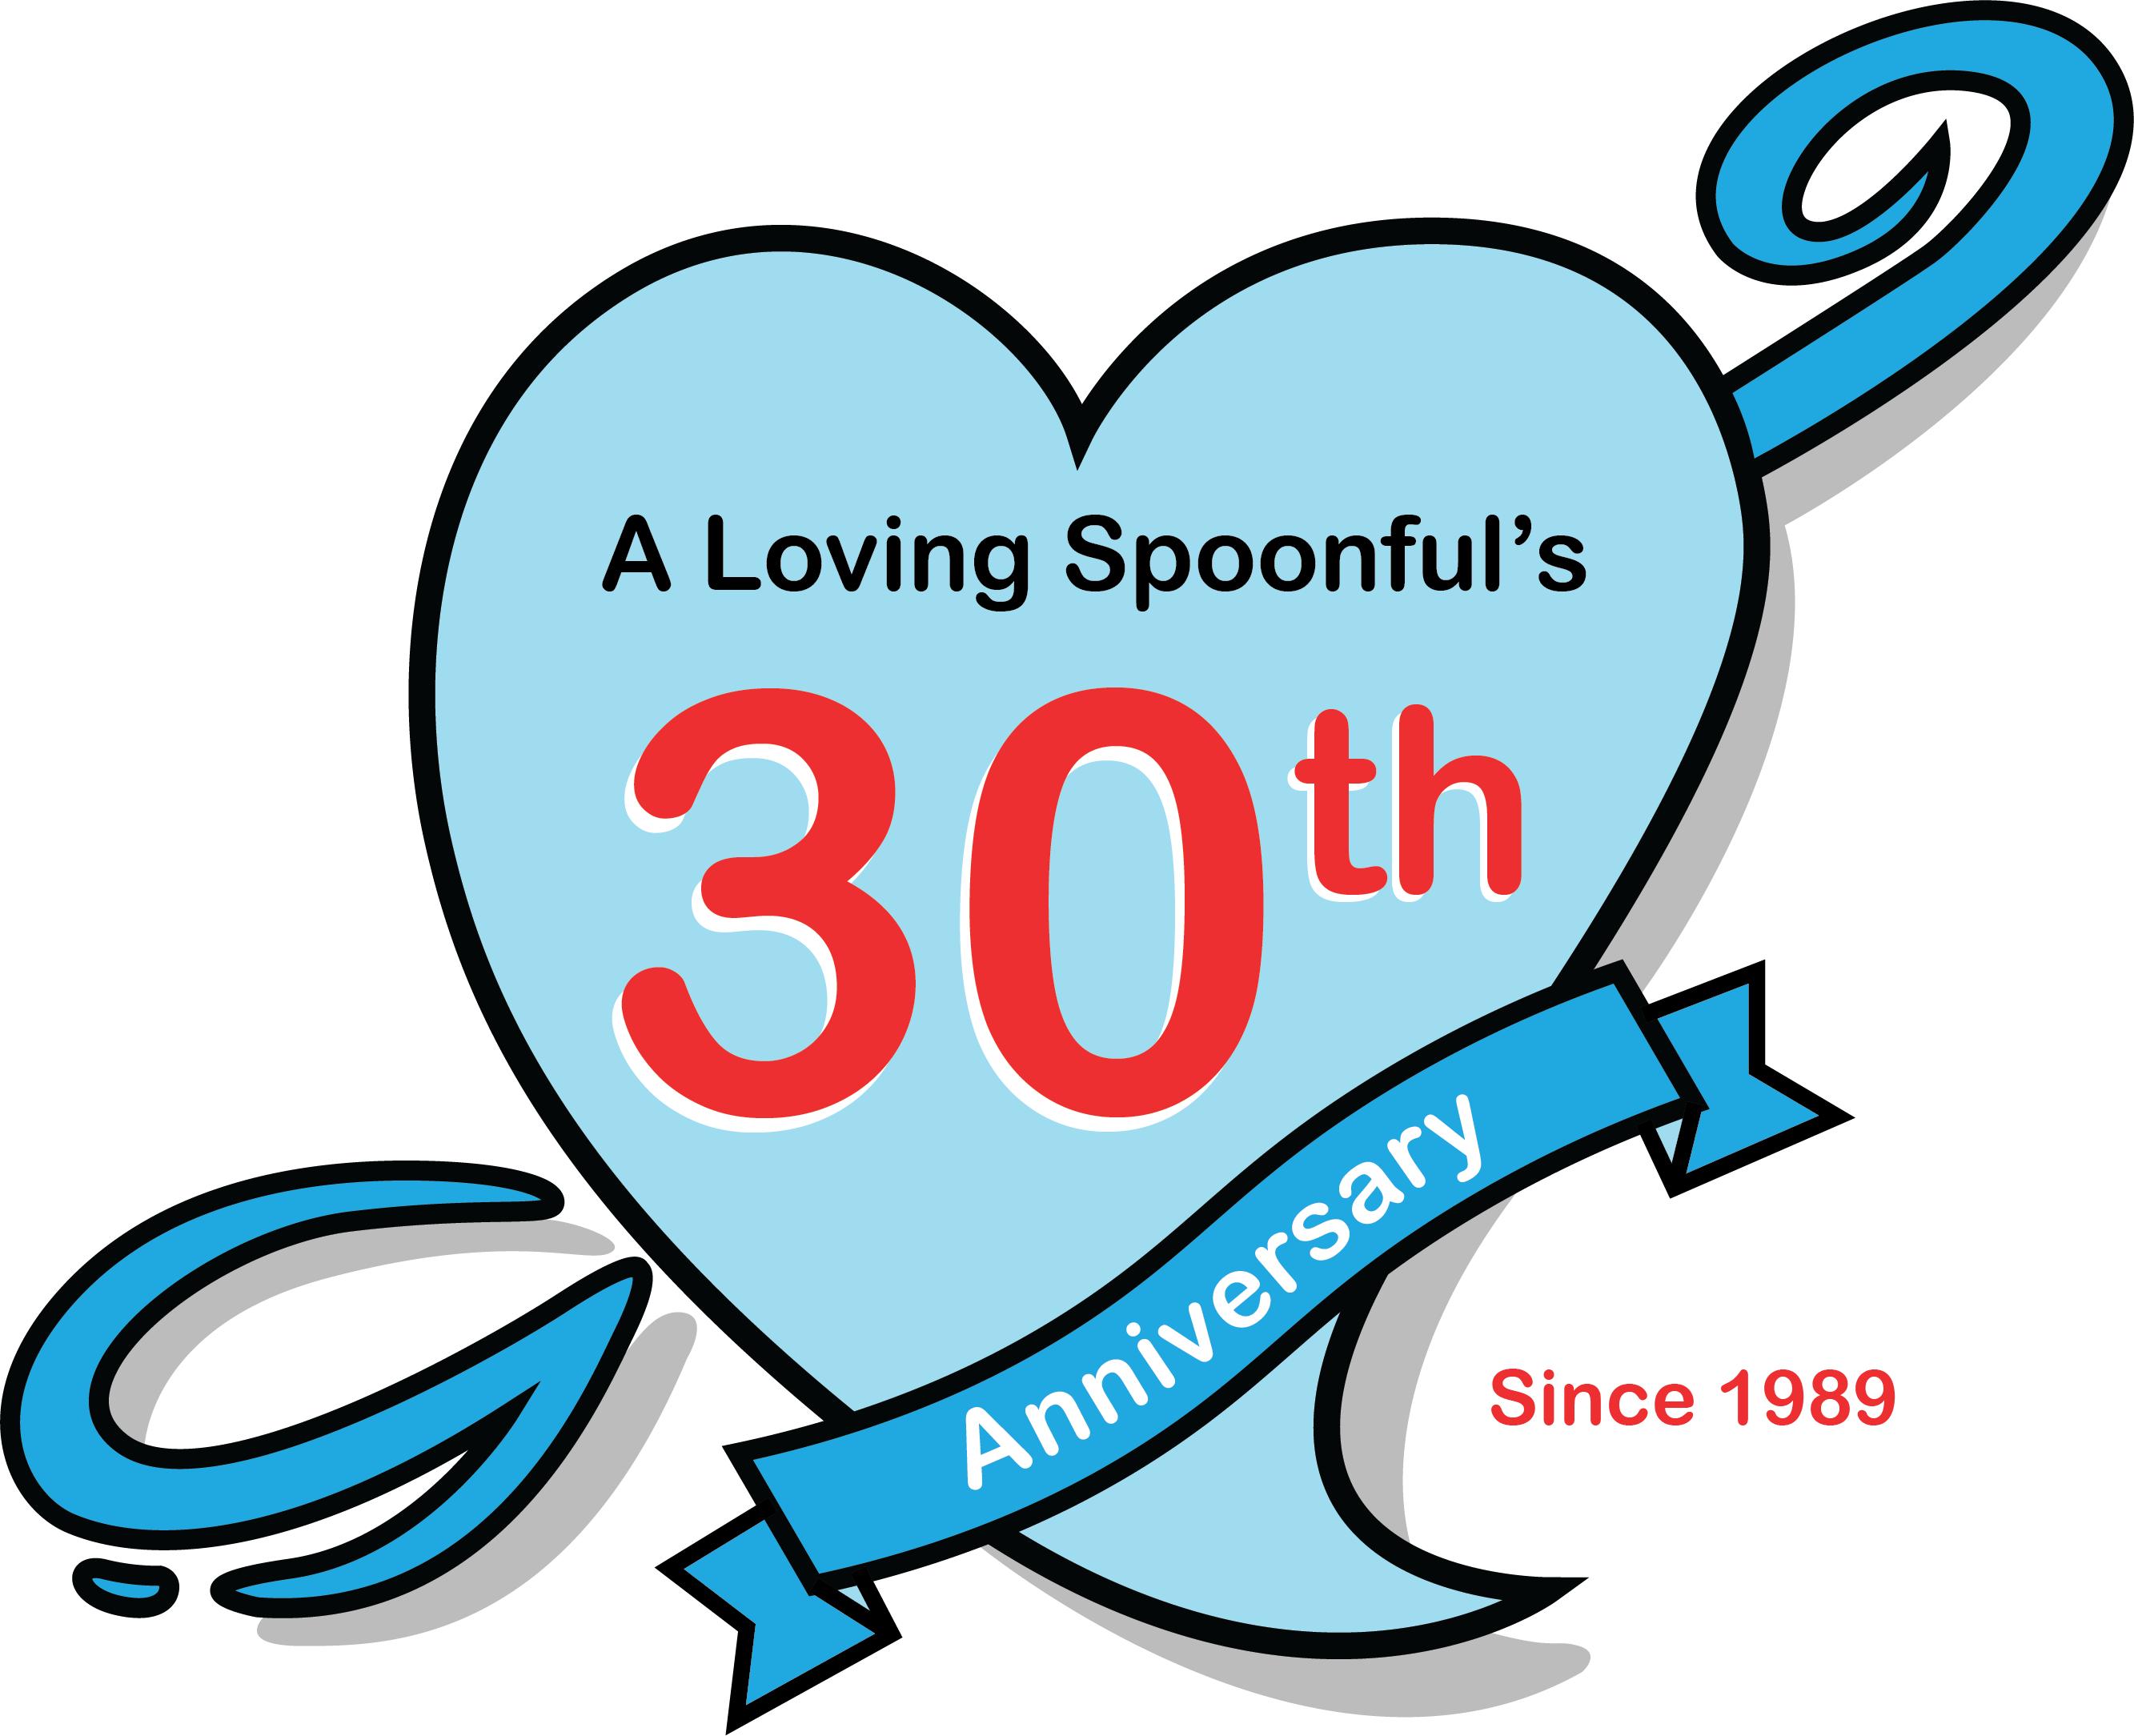 A Loving Spoonful